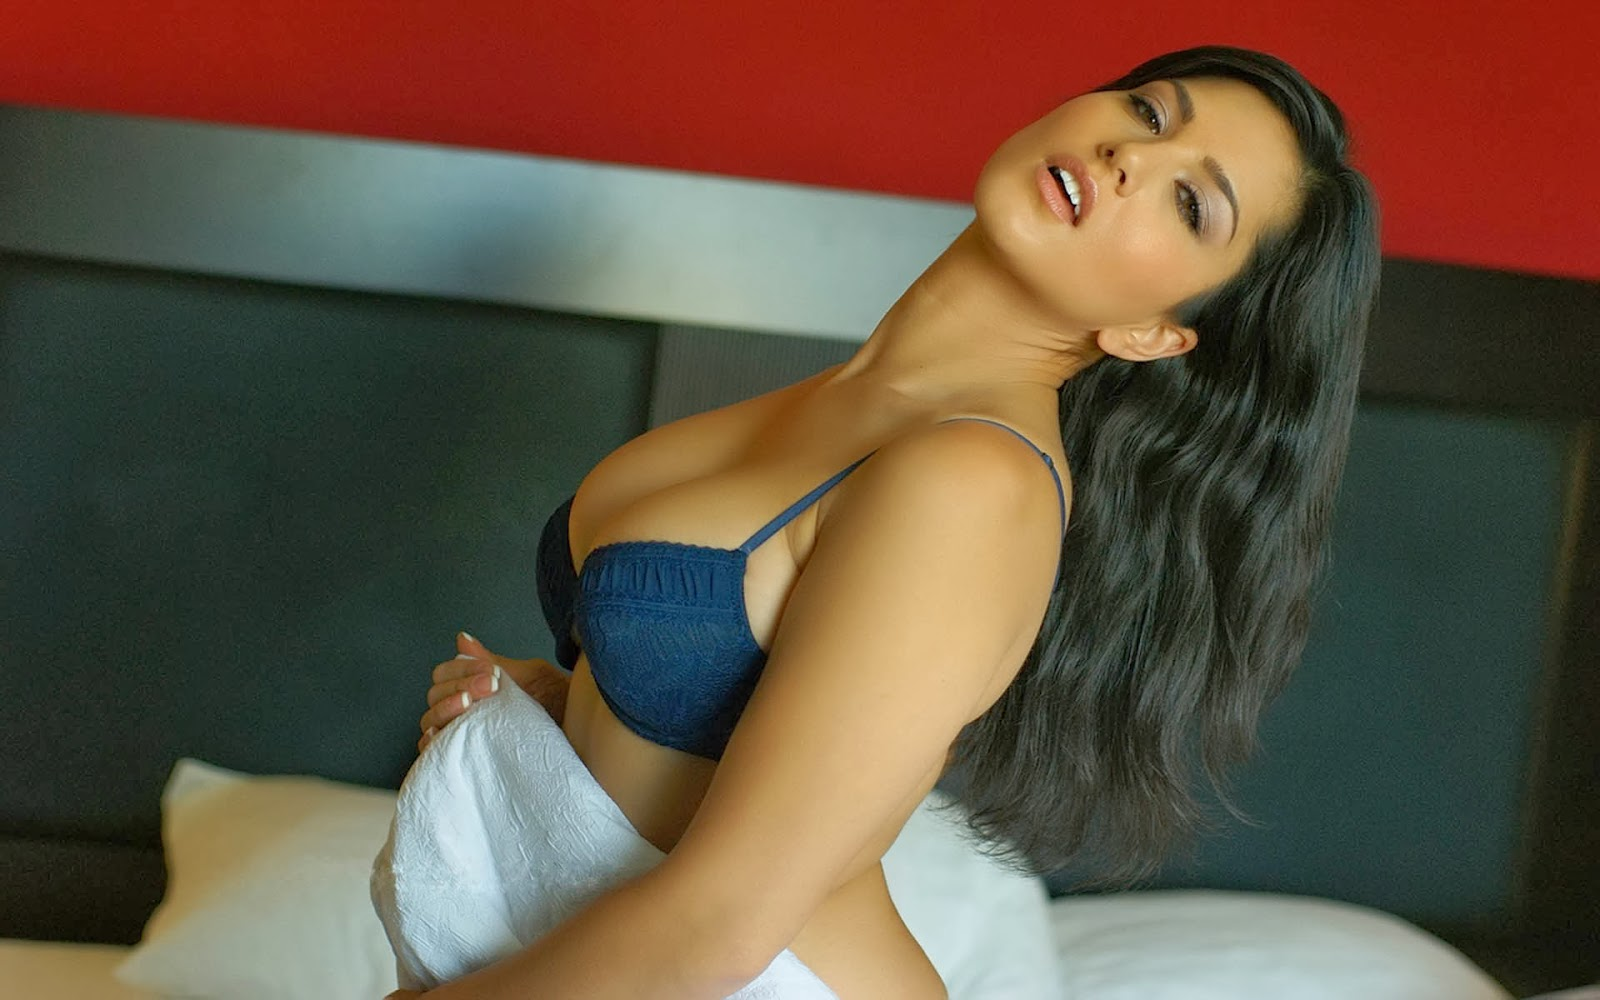 Sunny Leone blue bra Wallpaper image pictures photos